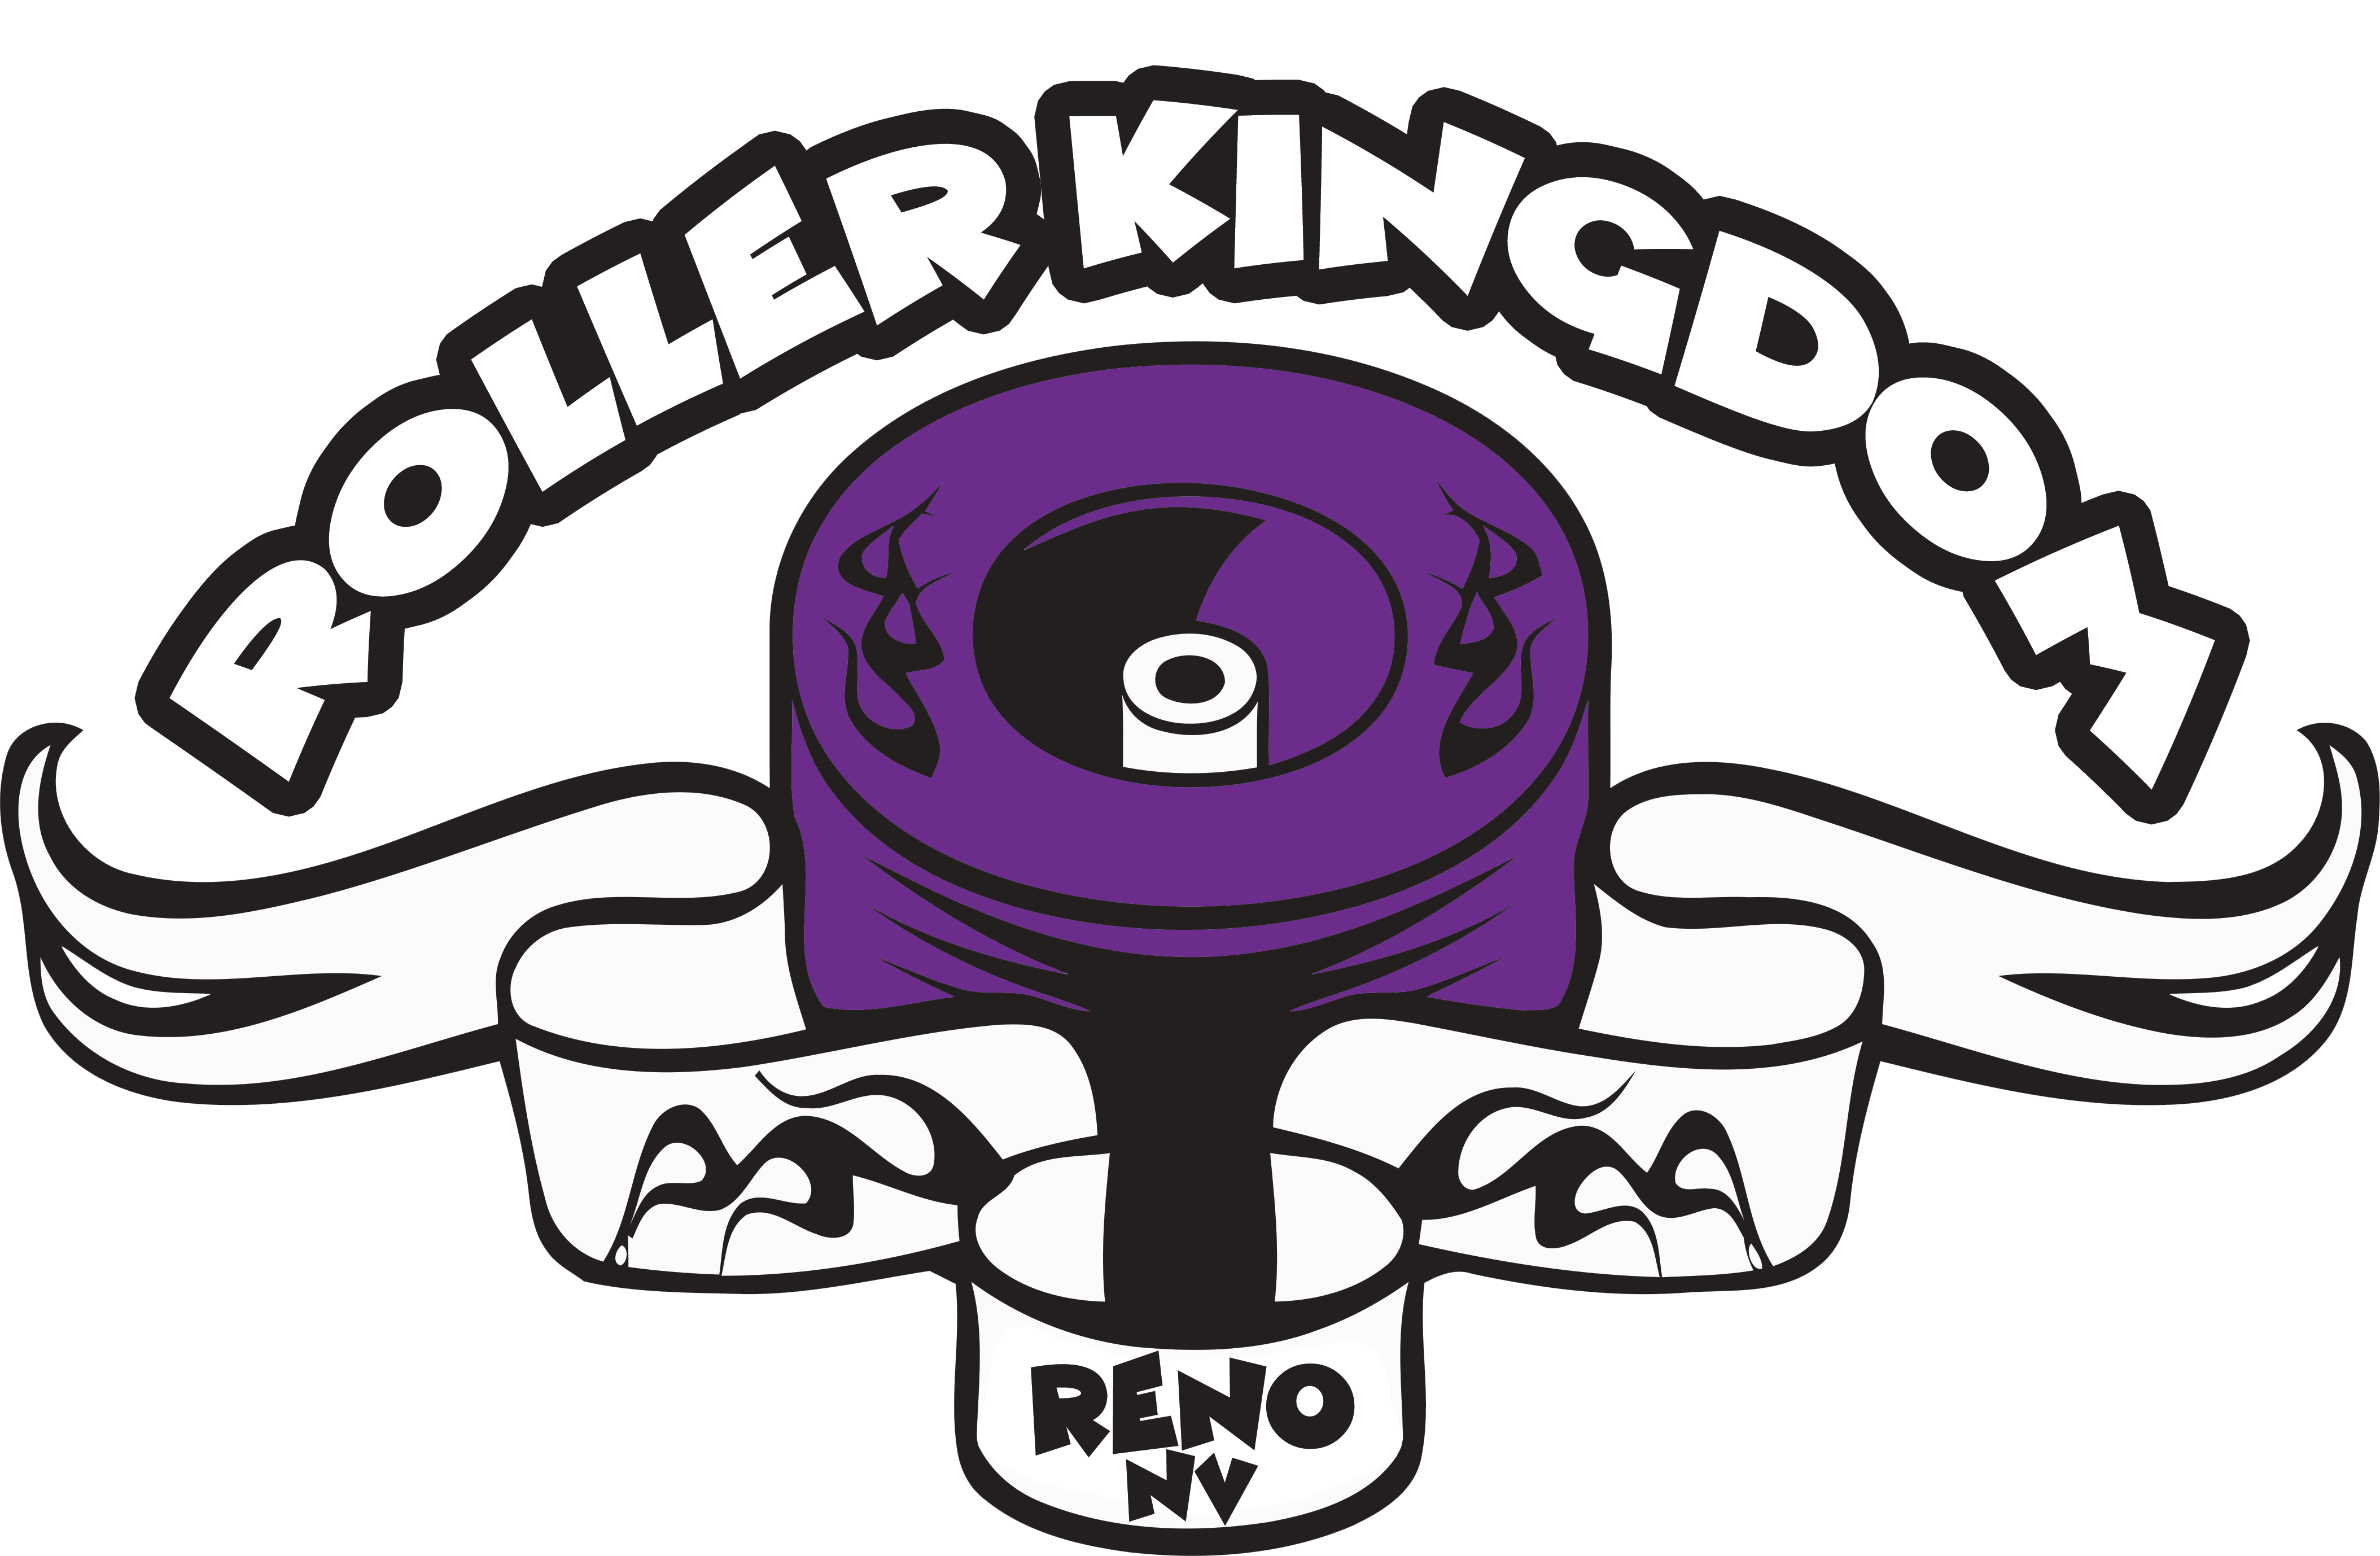 Roller Kingdom Family Fun Center